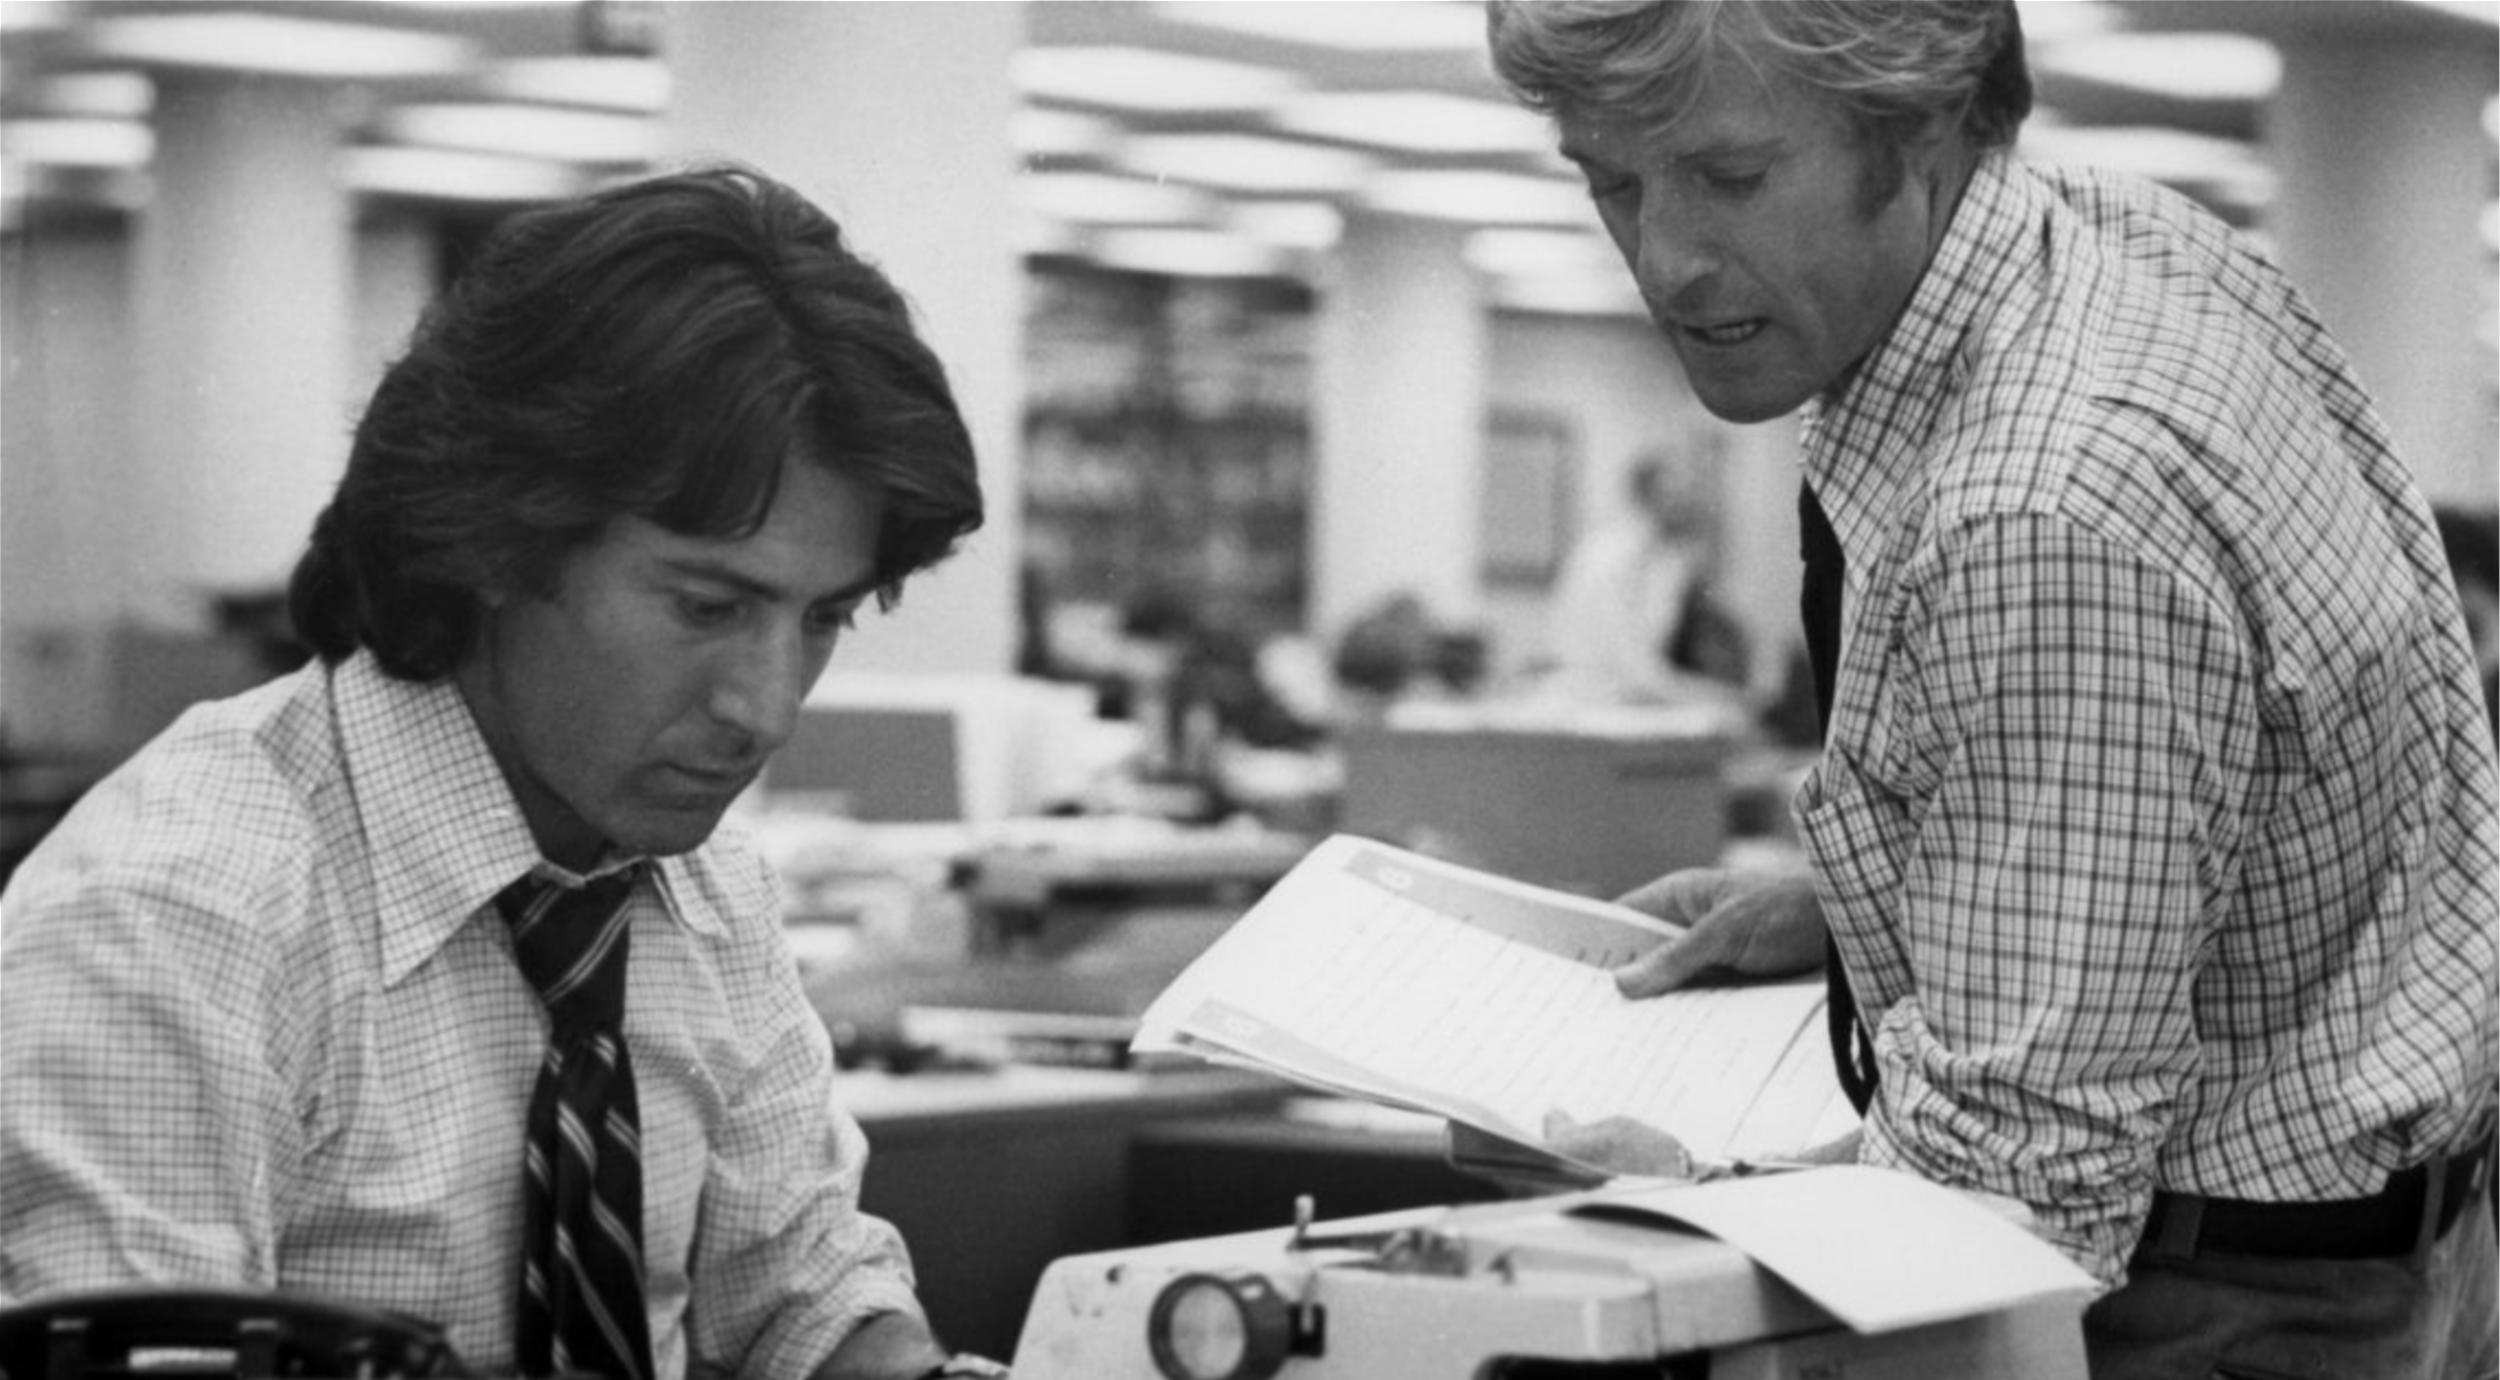 Investigative Journalism: All the President's Men